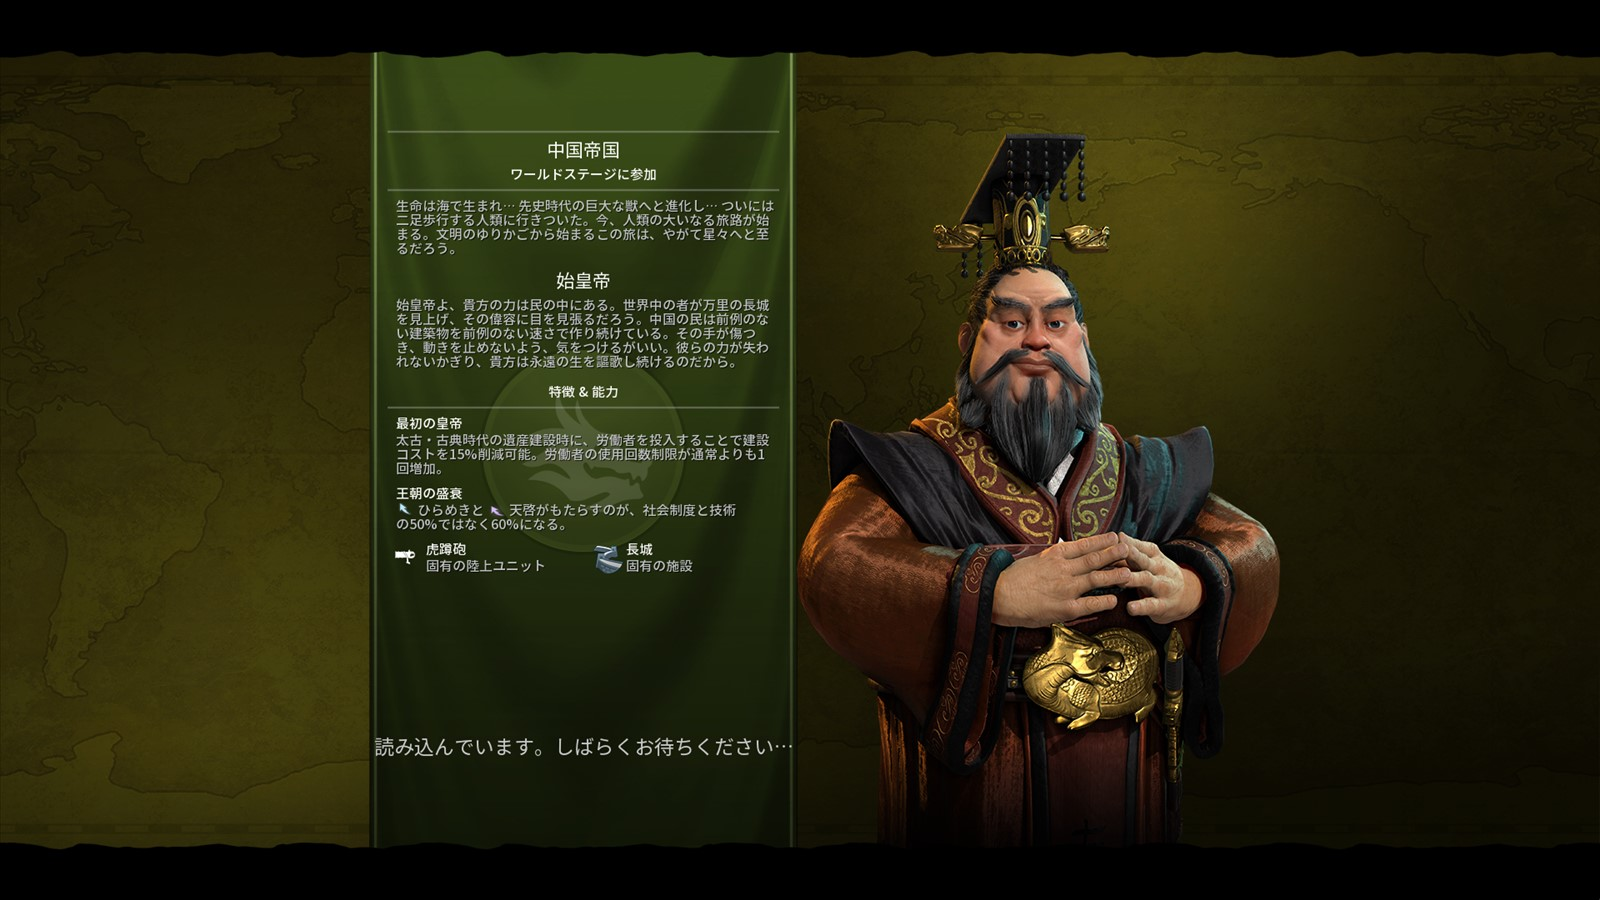 occ_qin000始皇帝.jpg